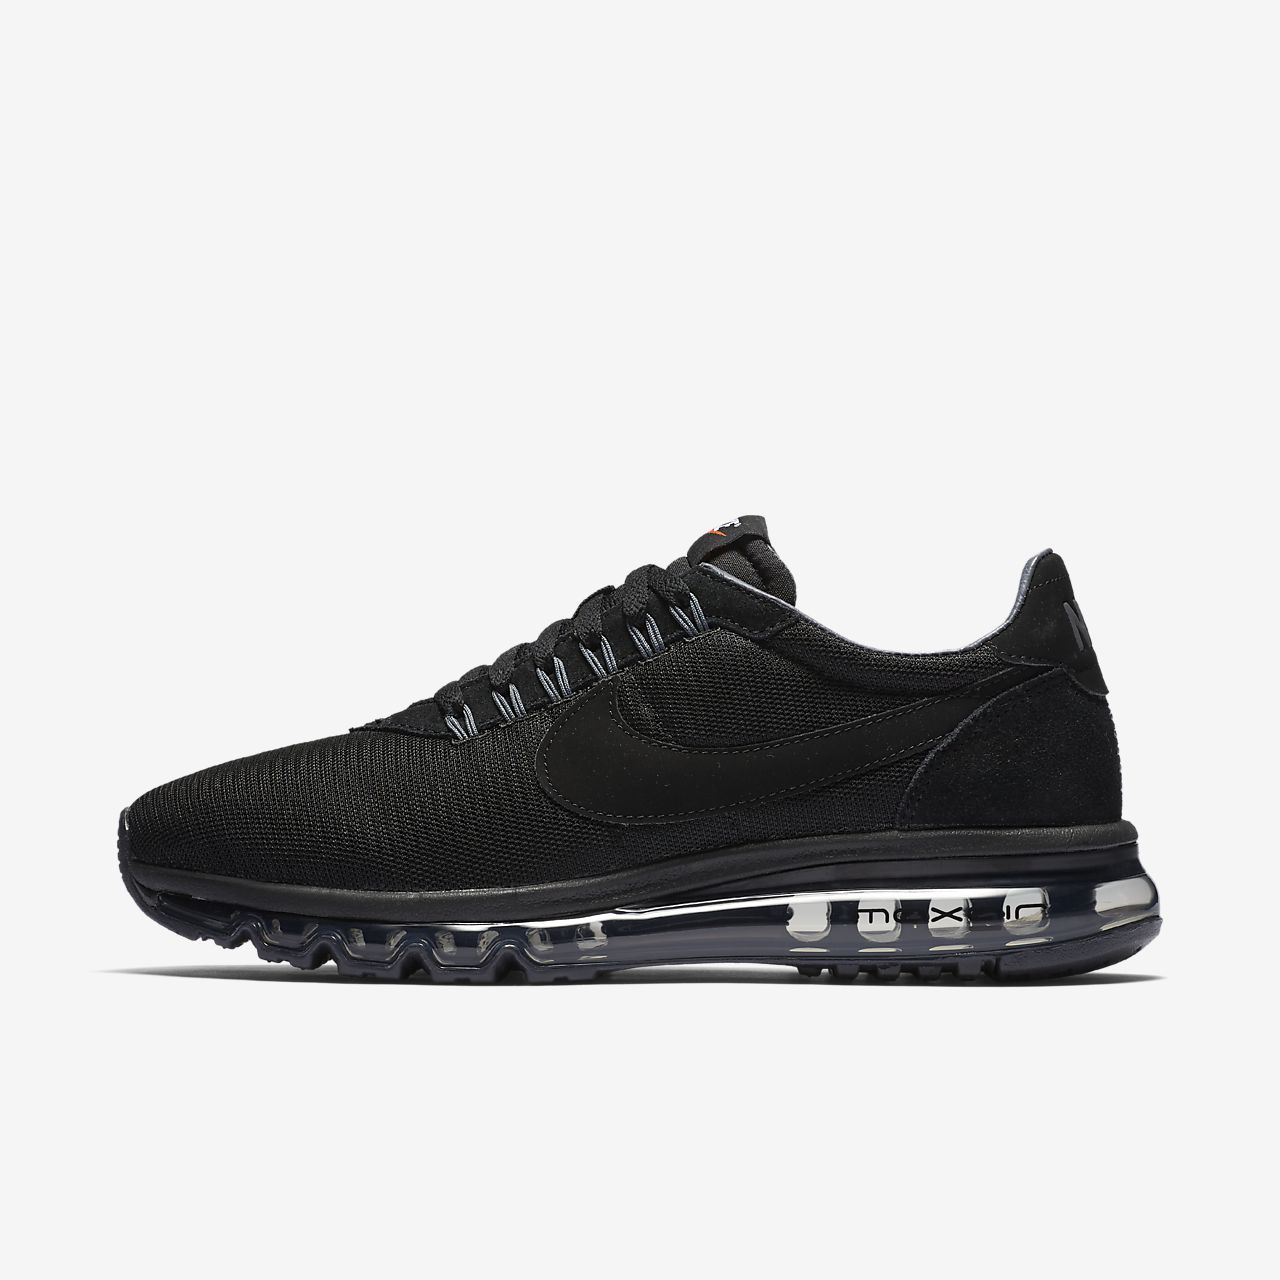 sports shoes 6a62b ed6a8 ... Nike Air Max LD-Zero Unisex Ayakkabı